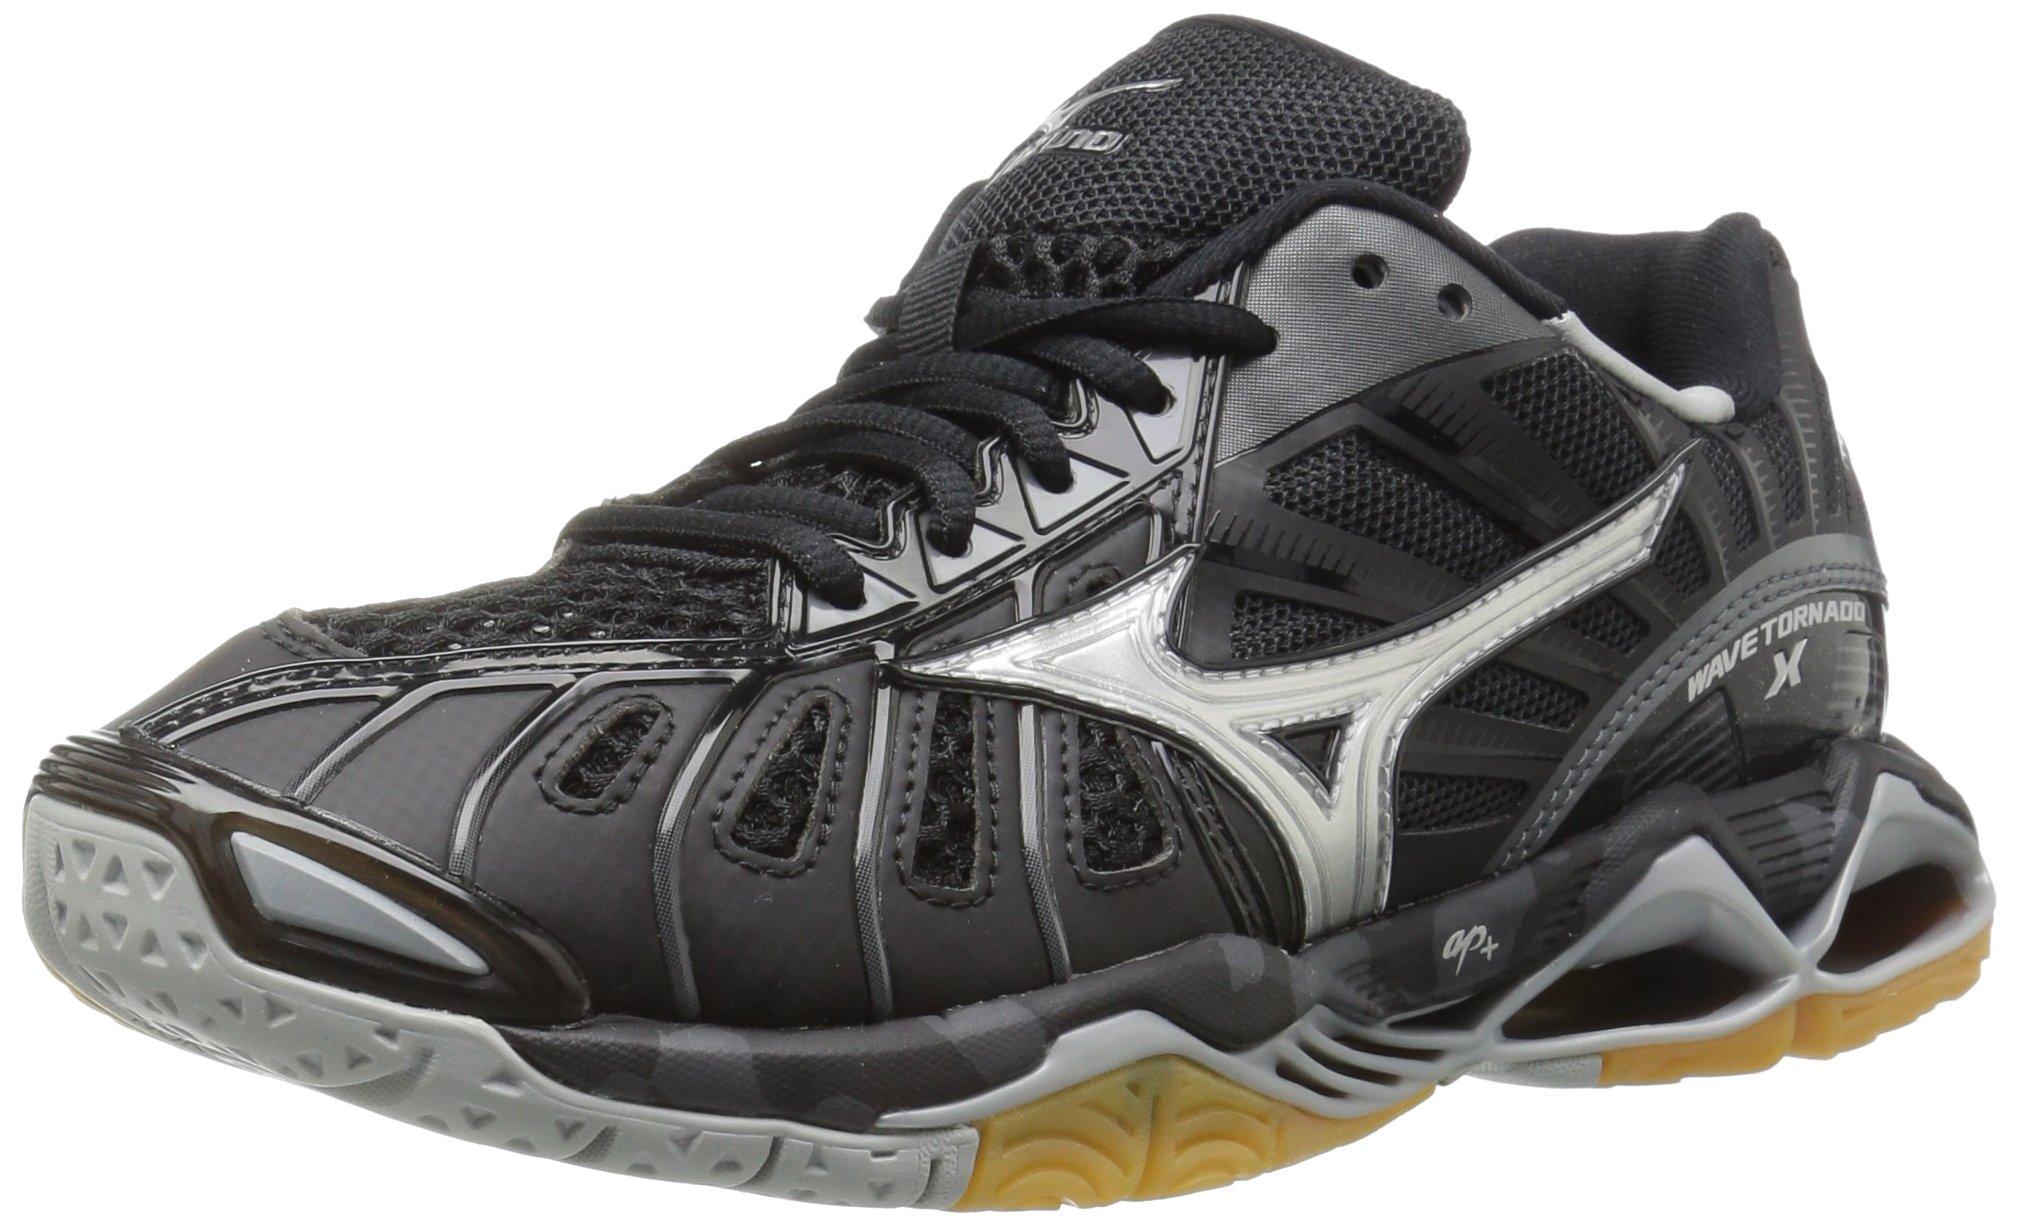 Mizuno Wave Tornado X Womens Volleyball Shoes, Black/Silver 6 B US